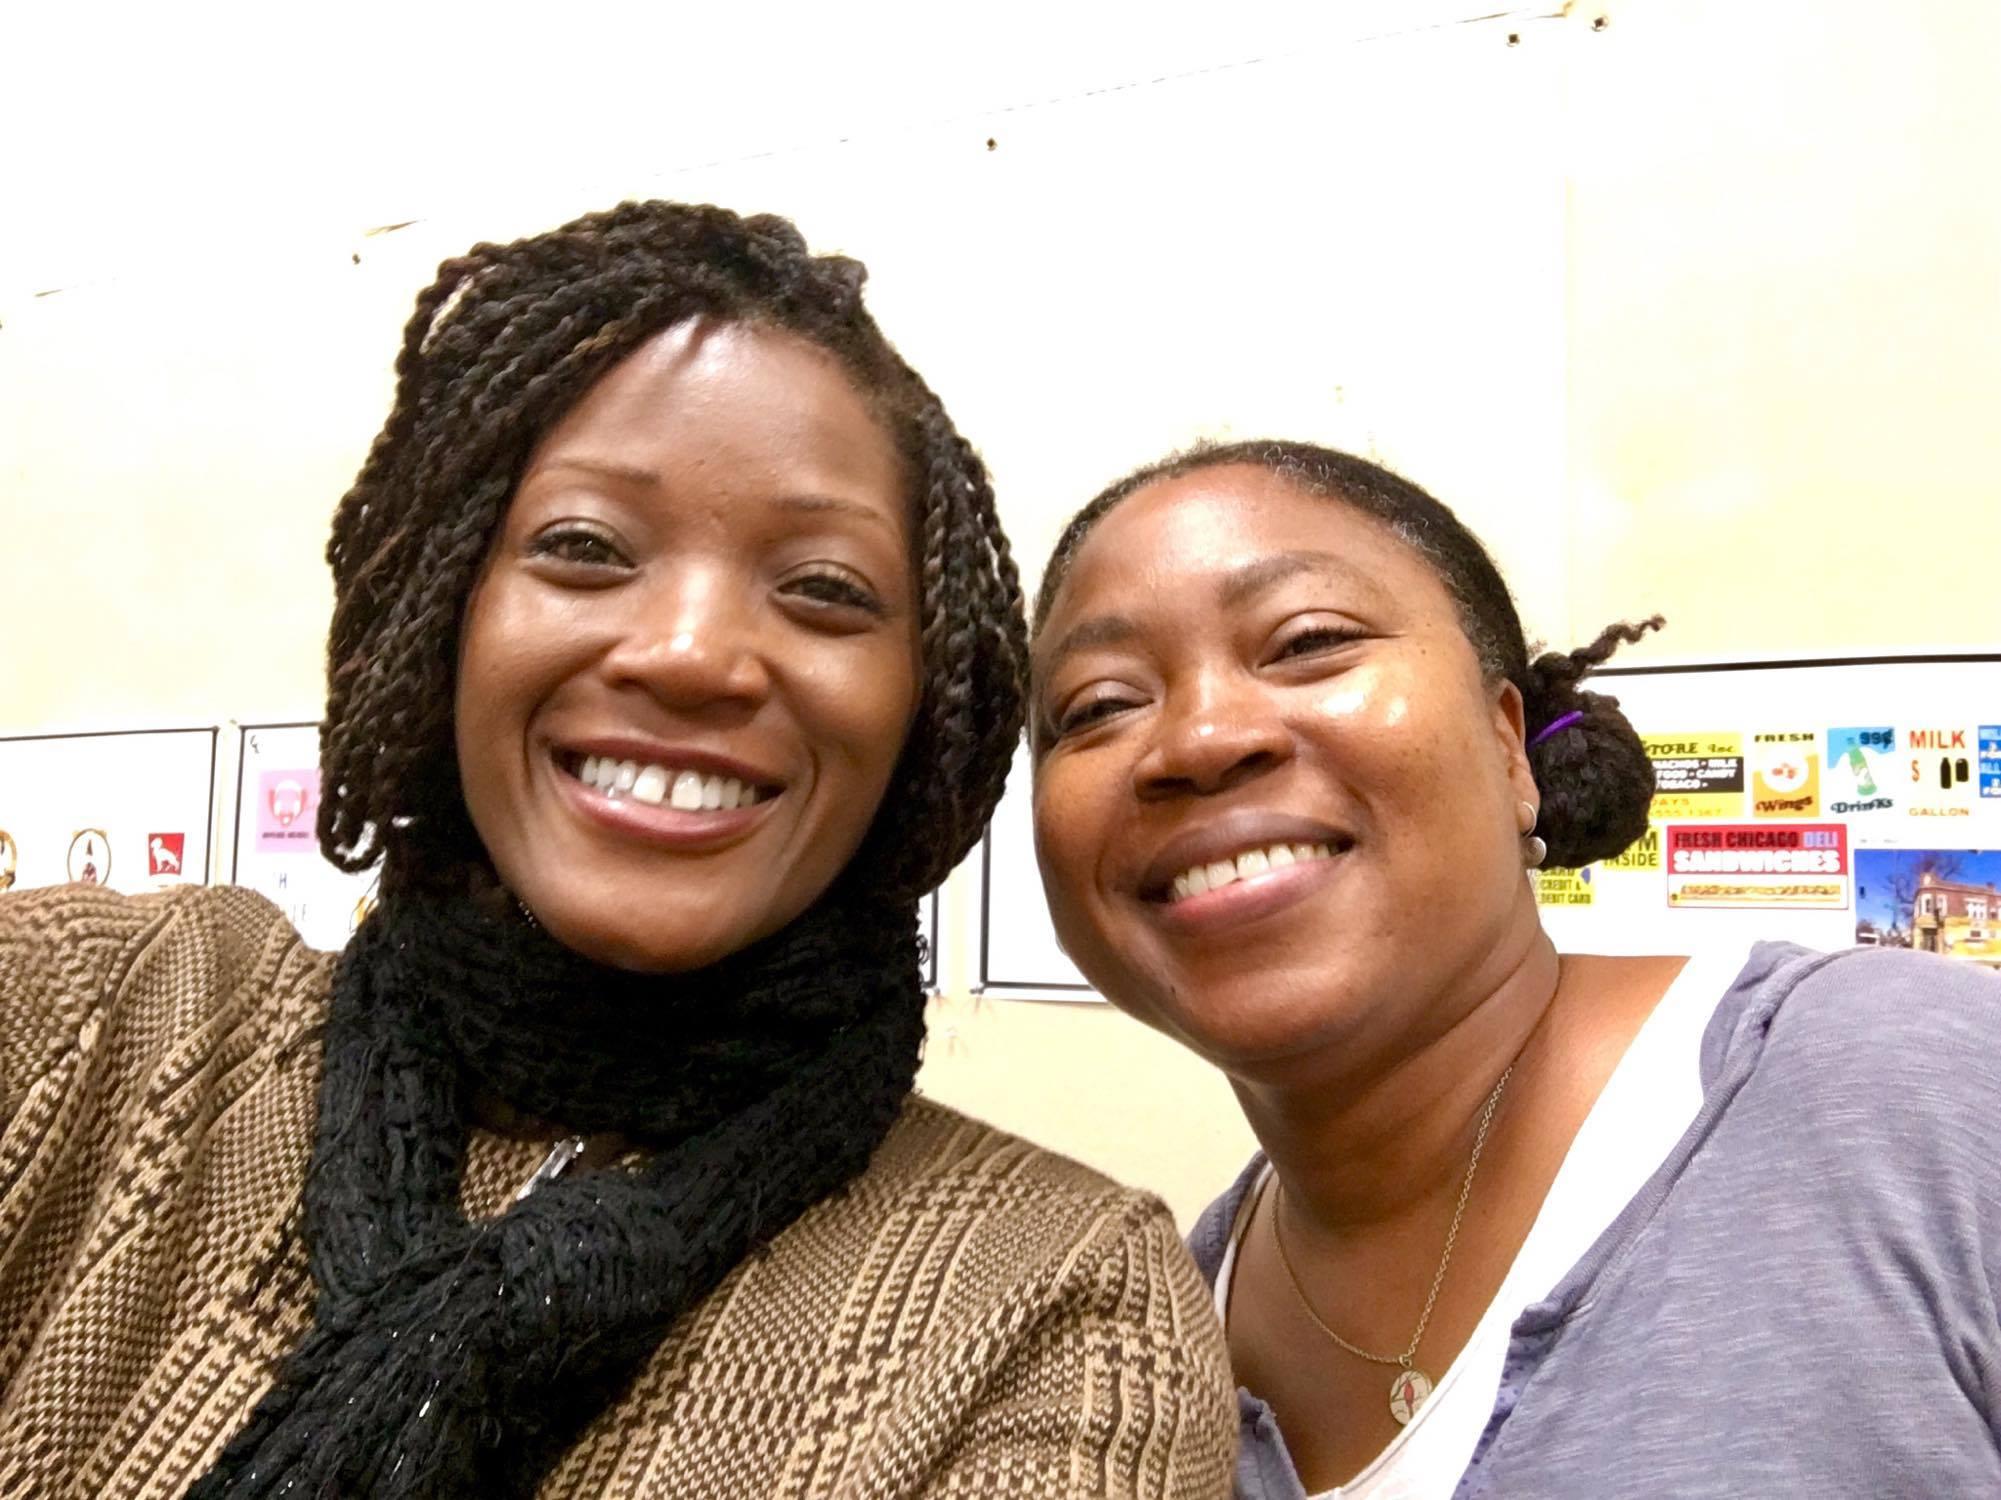 With director Tanya Hamilton